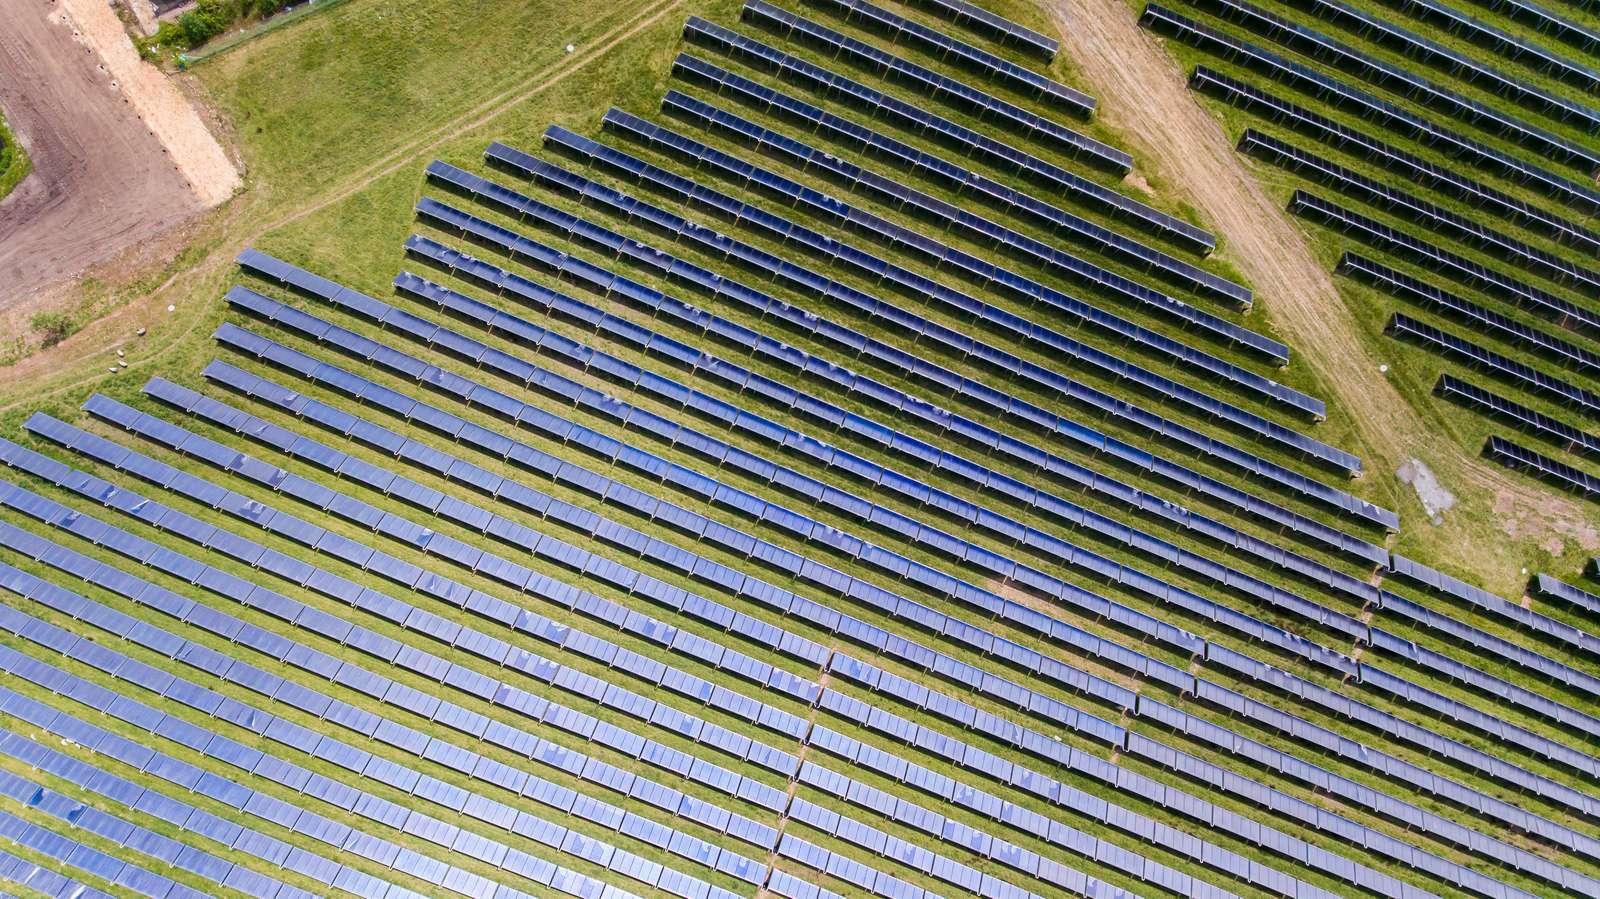 Sønderborg Kommune nærmer sig målet for solenergi